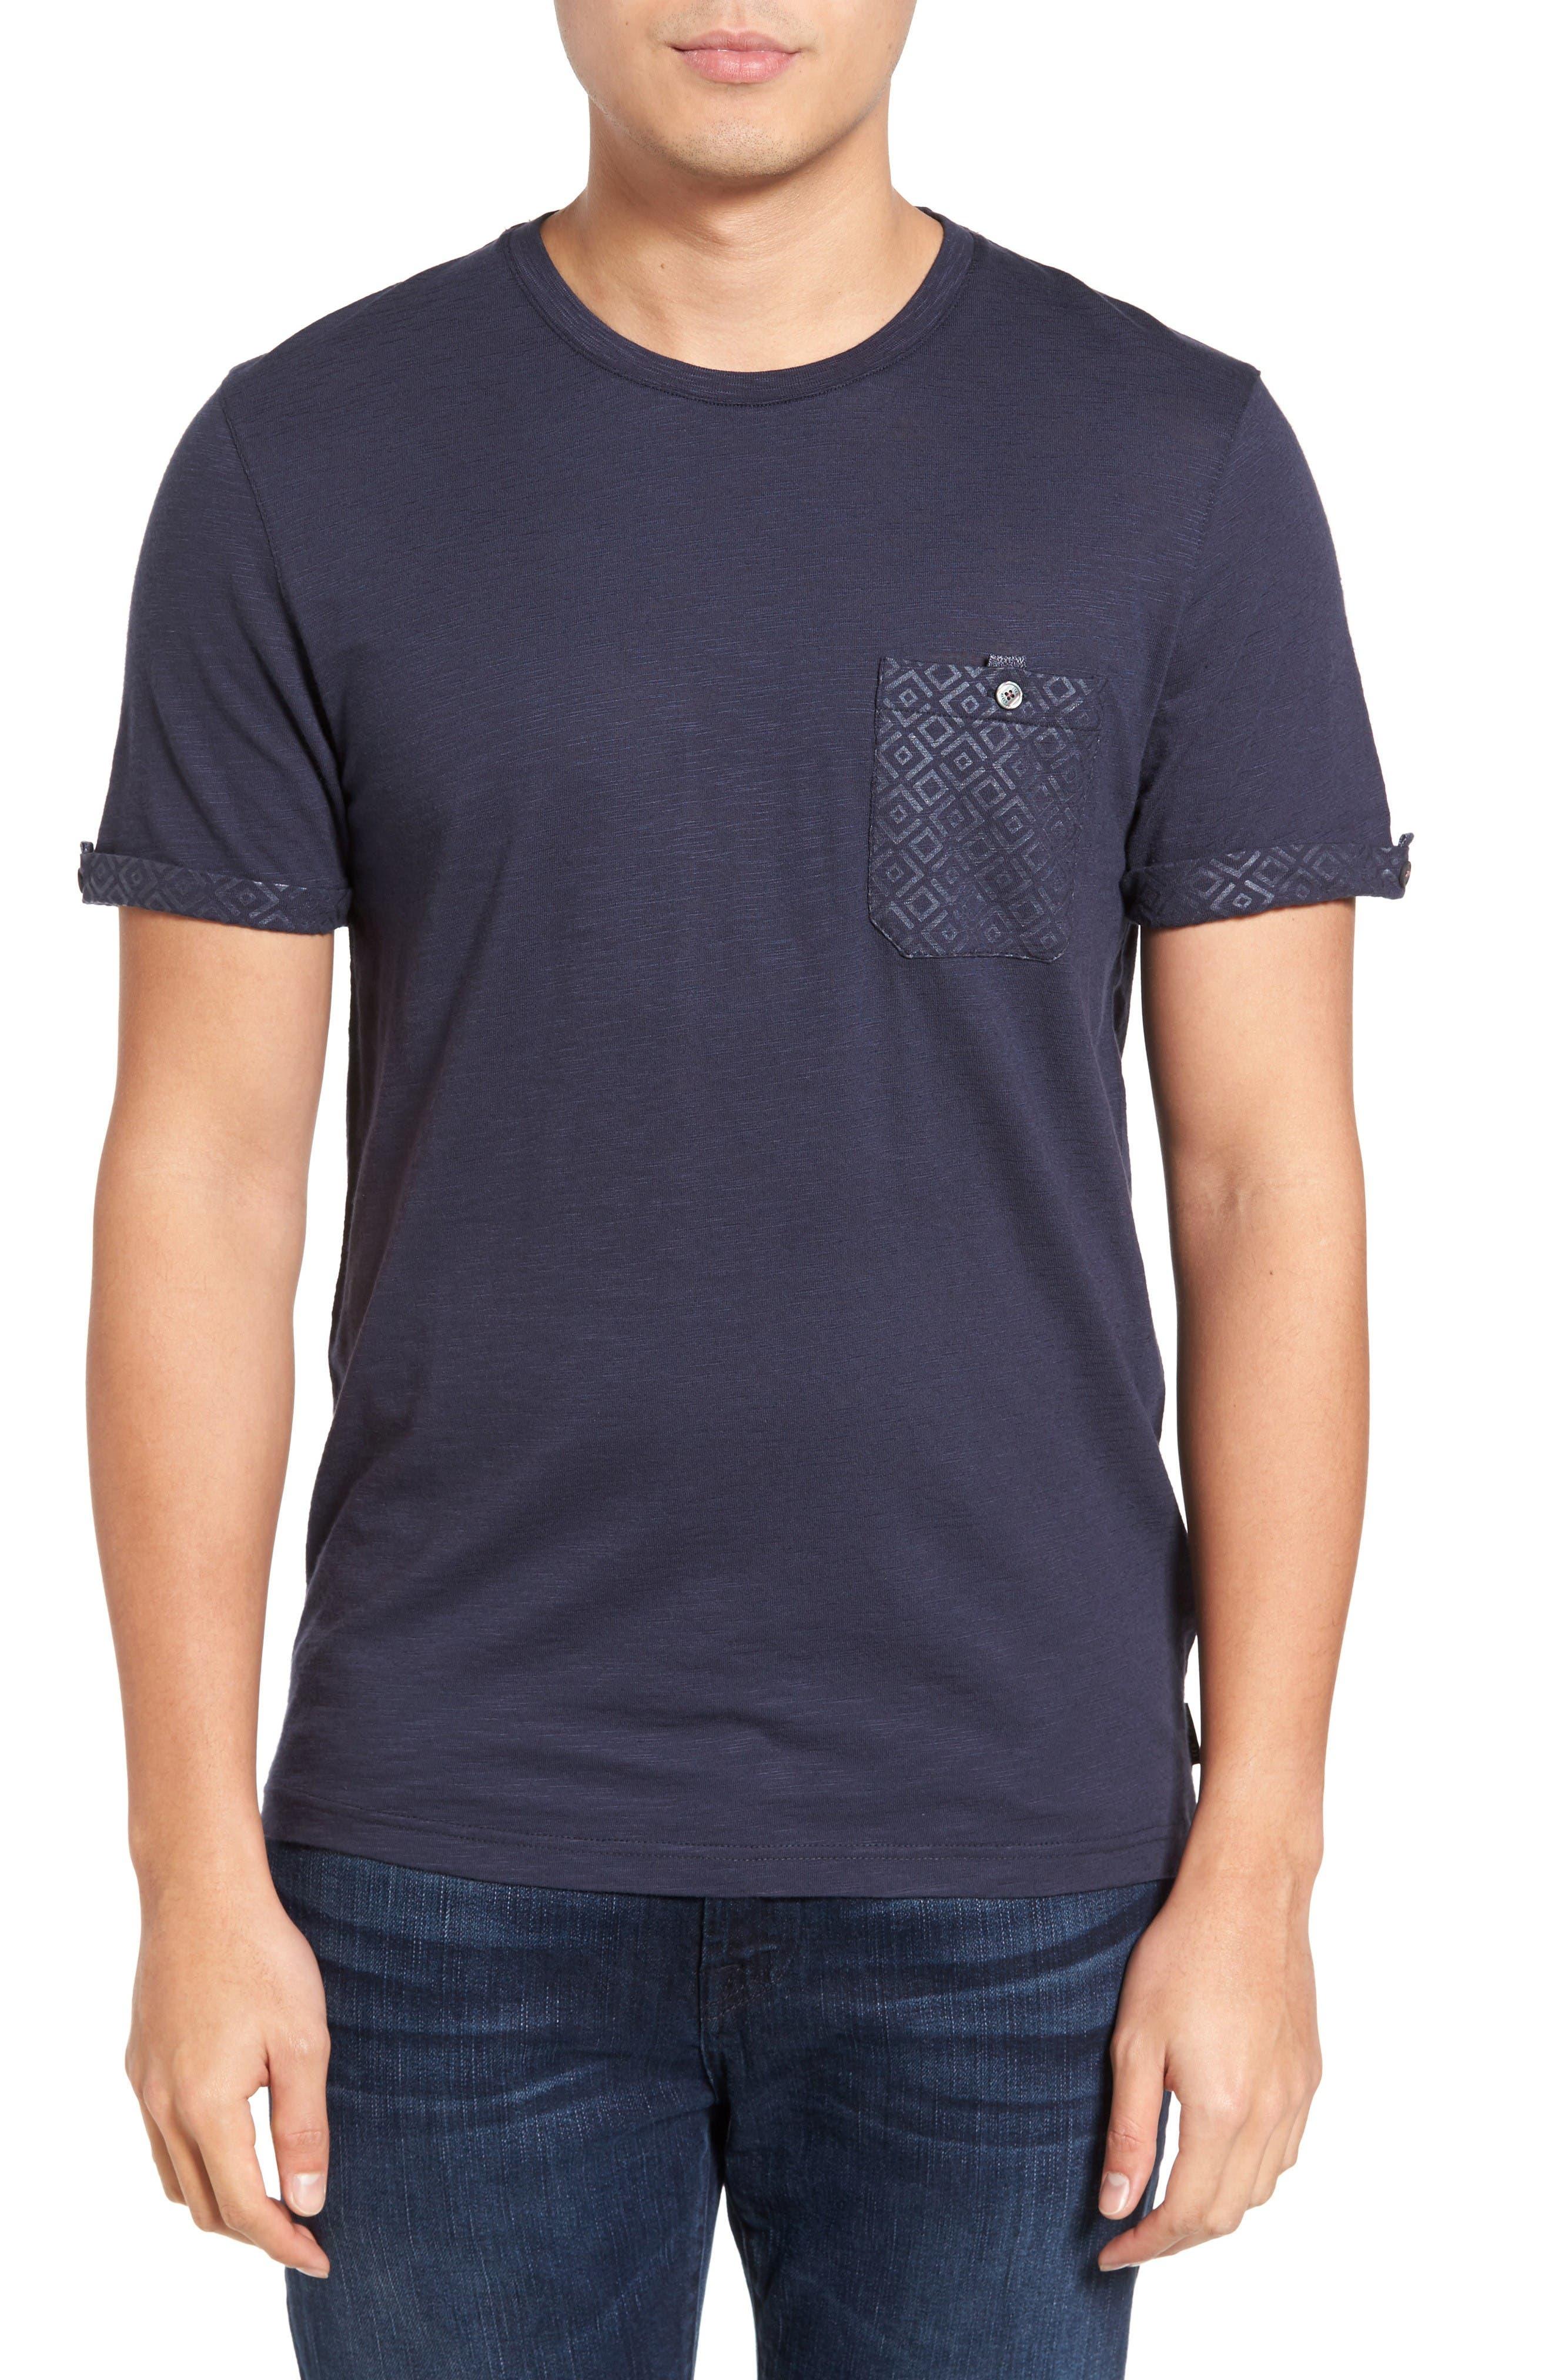 Ted Baker London Apel Print Pocket T-Shirt